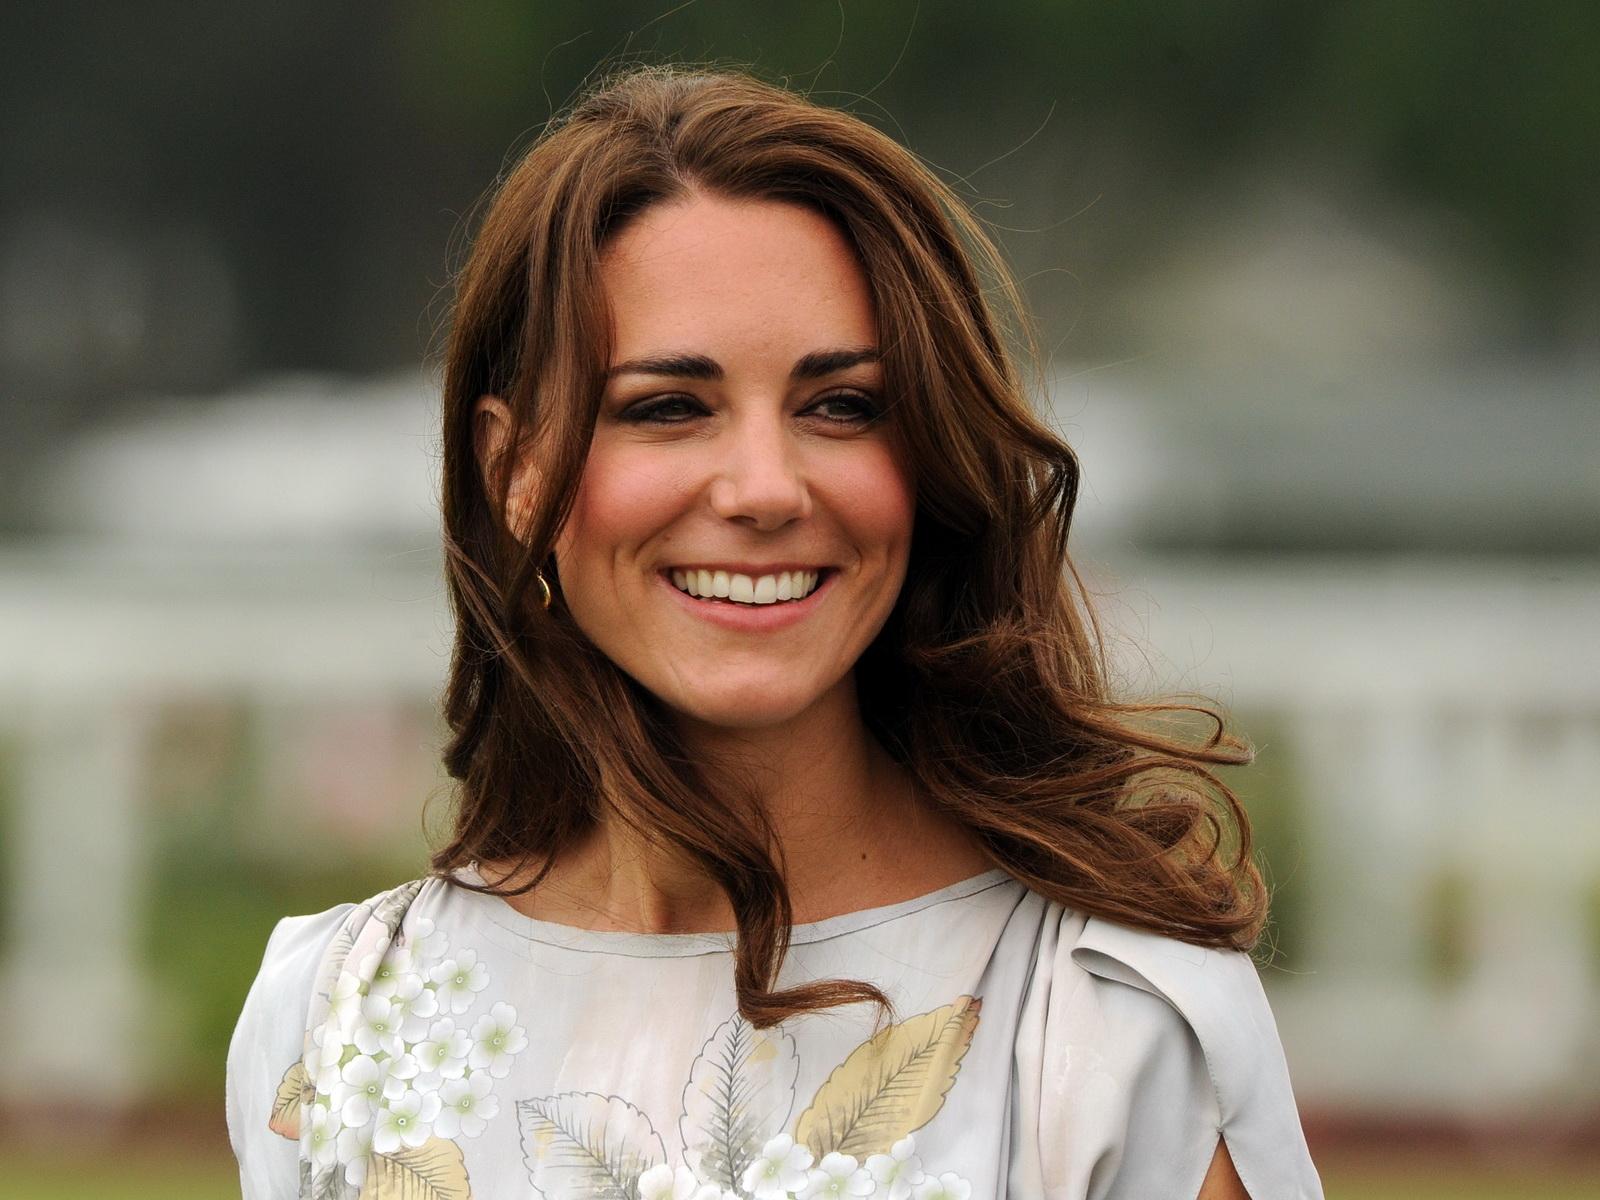 Kate Middleton (via theodysseyonline.com)